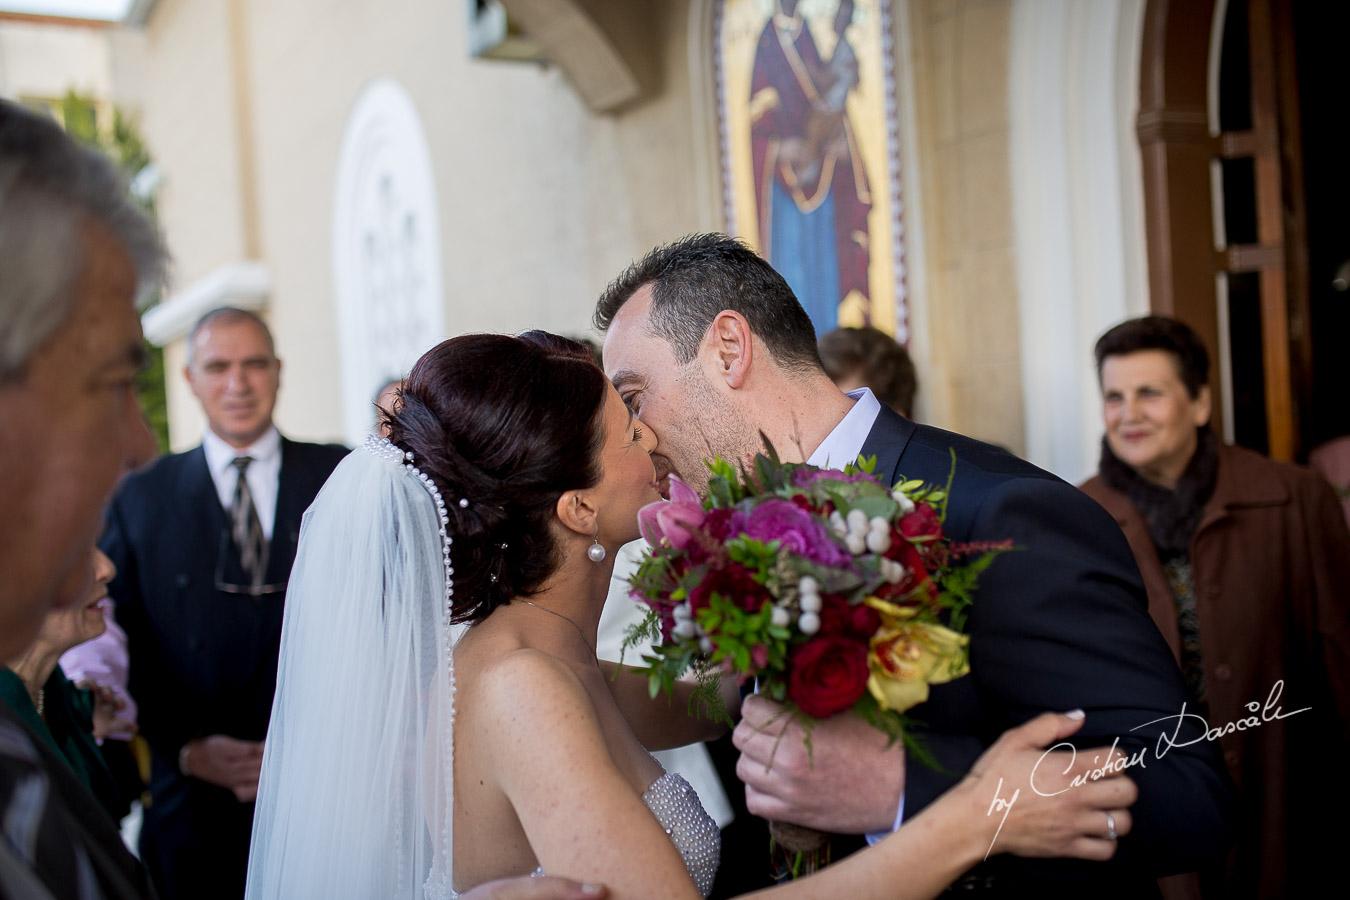 Wedding of Costas & Maria - Nicosia, Agios Dometios 23